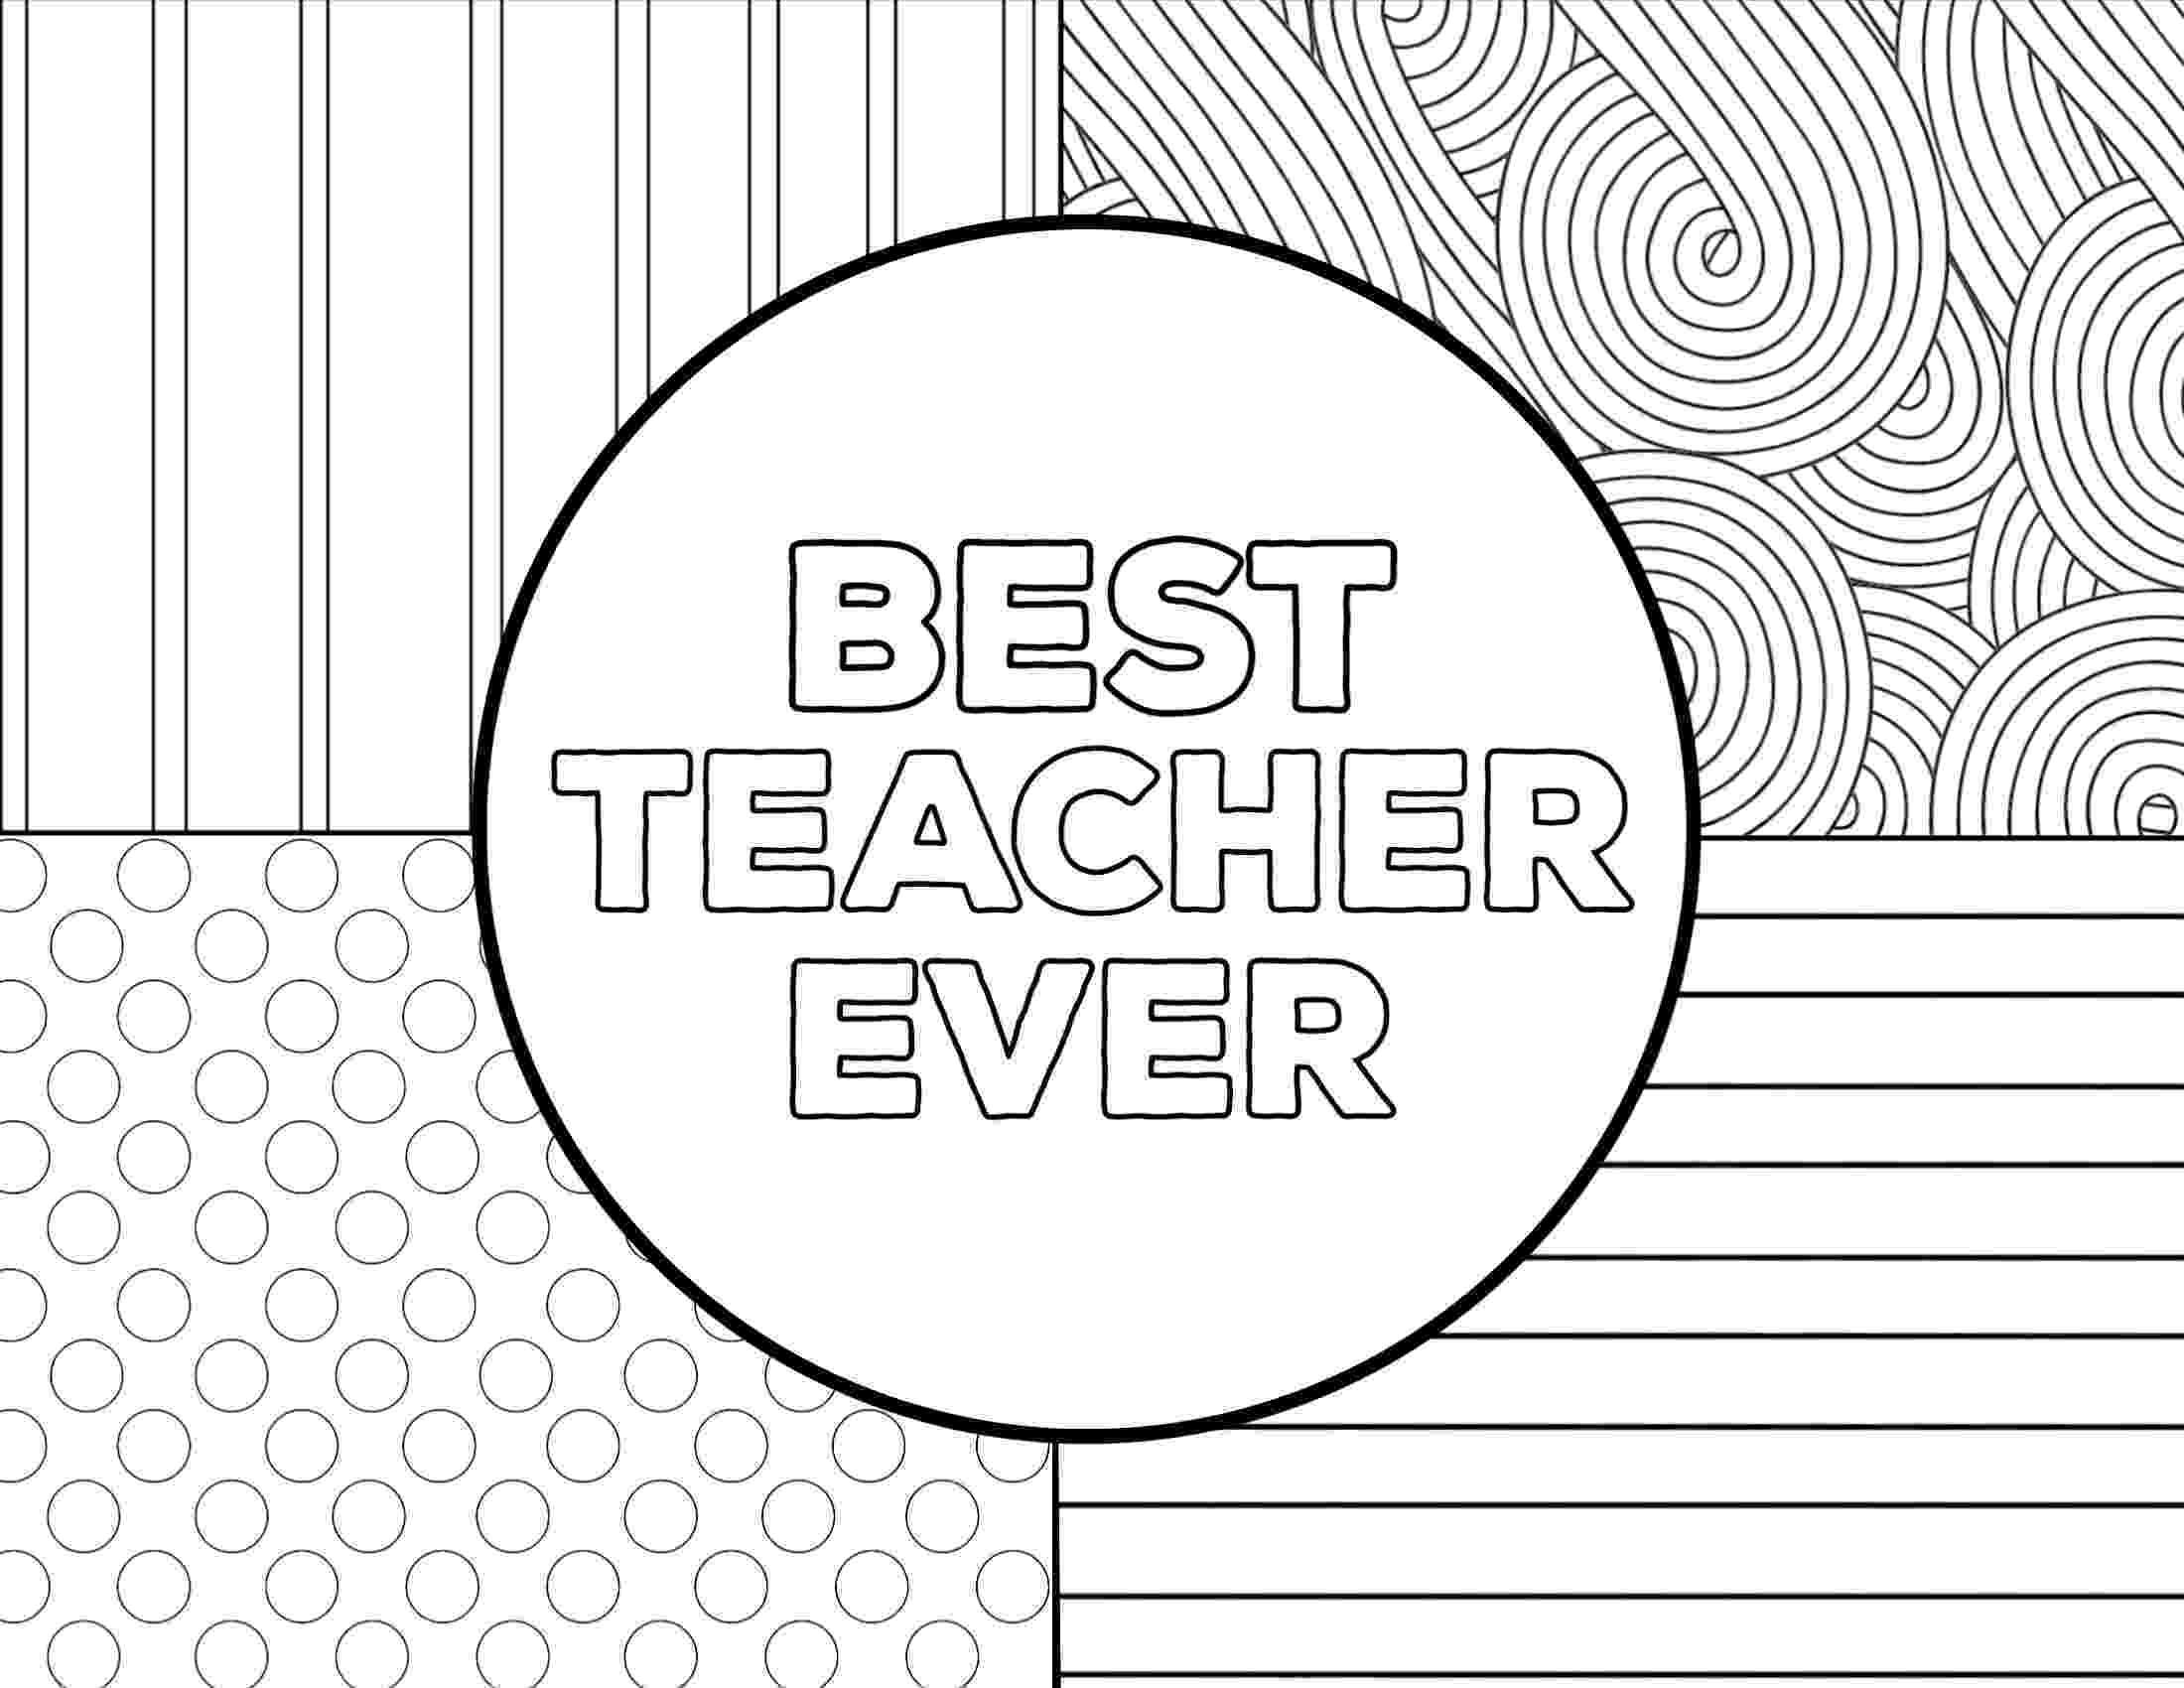 best teacher ever coloring pages 22 best school spirit coloring pages for kids updated 2018 coloring ever teacher best pages